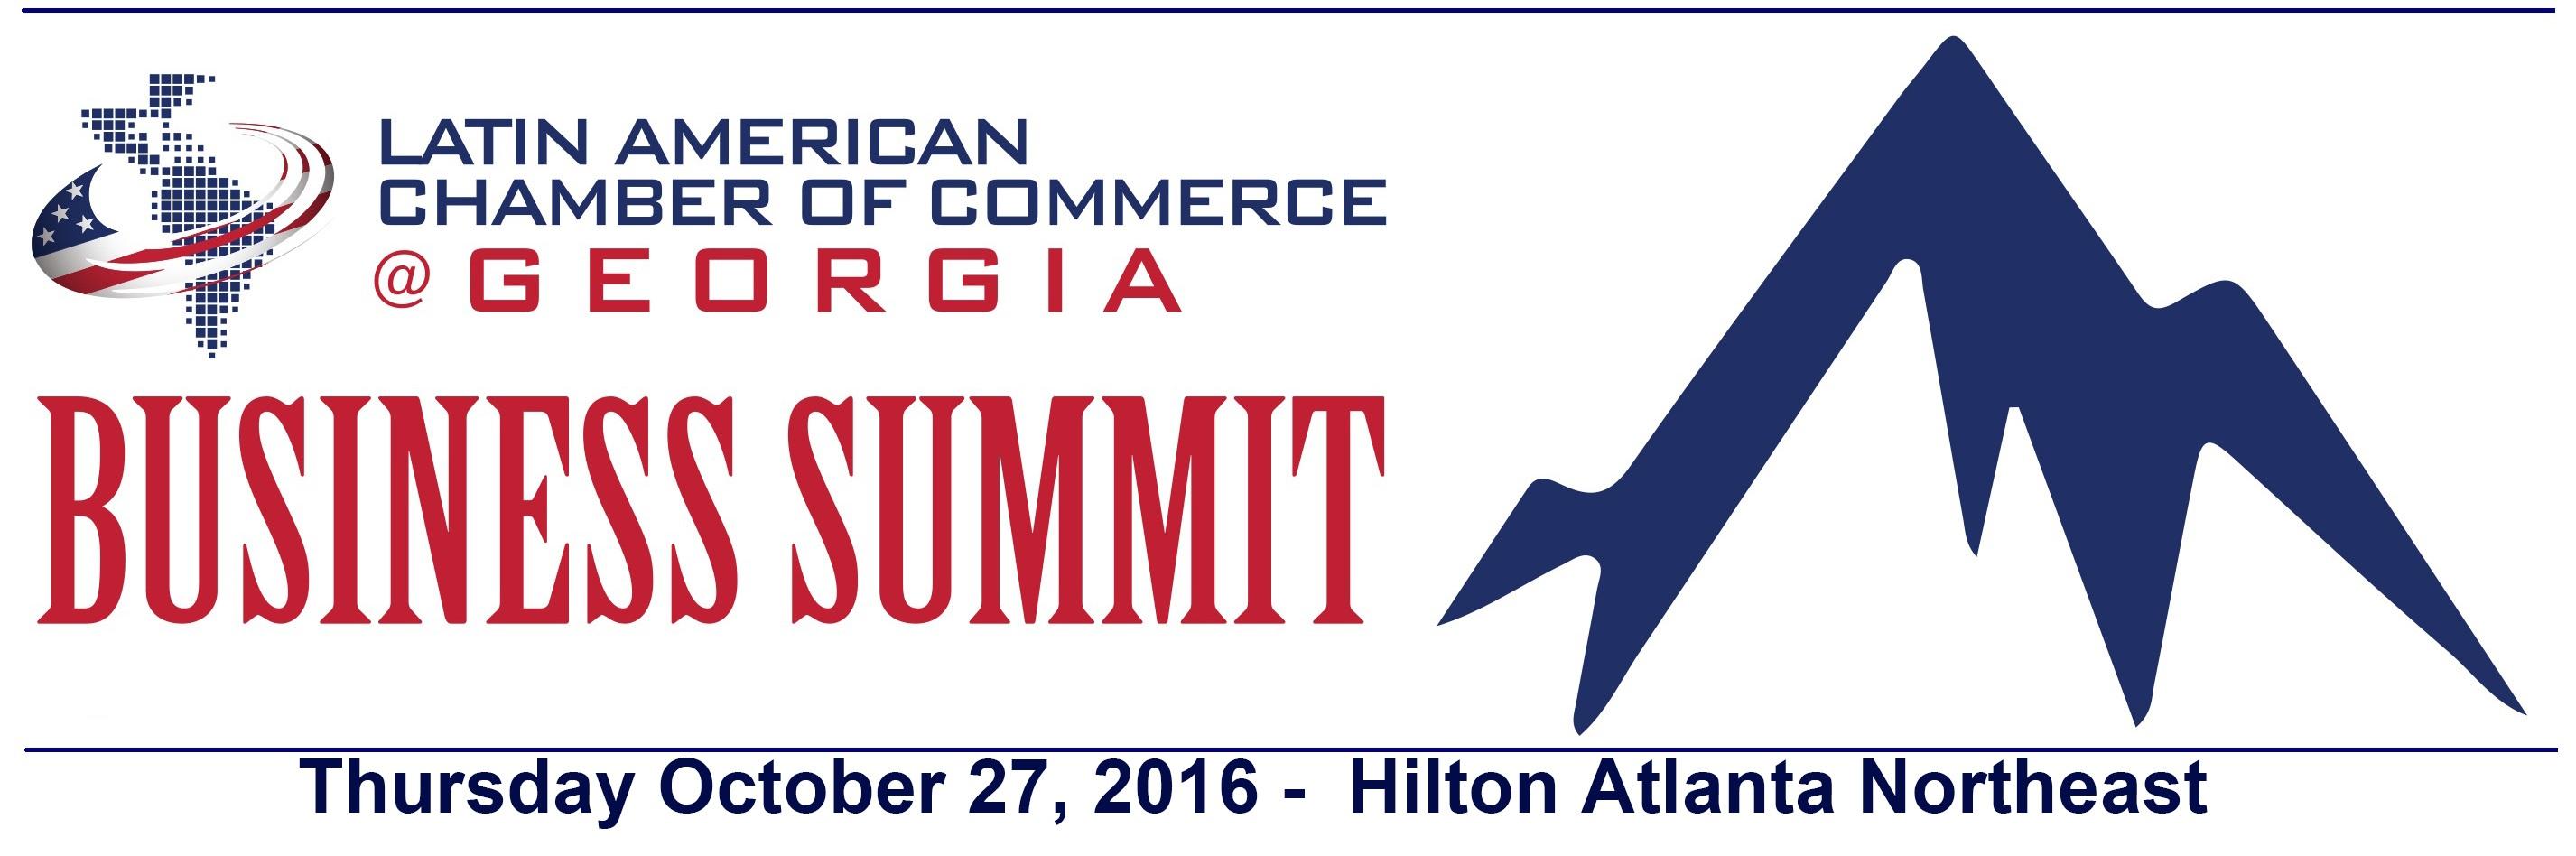 LOGO-Horizontal-----LACC-Buss-Summit-10-27-2016.jpg